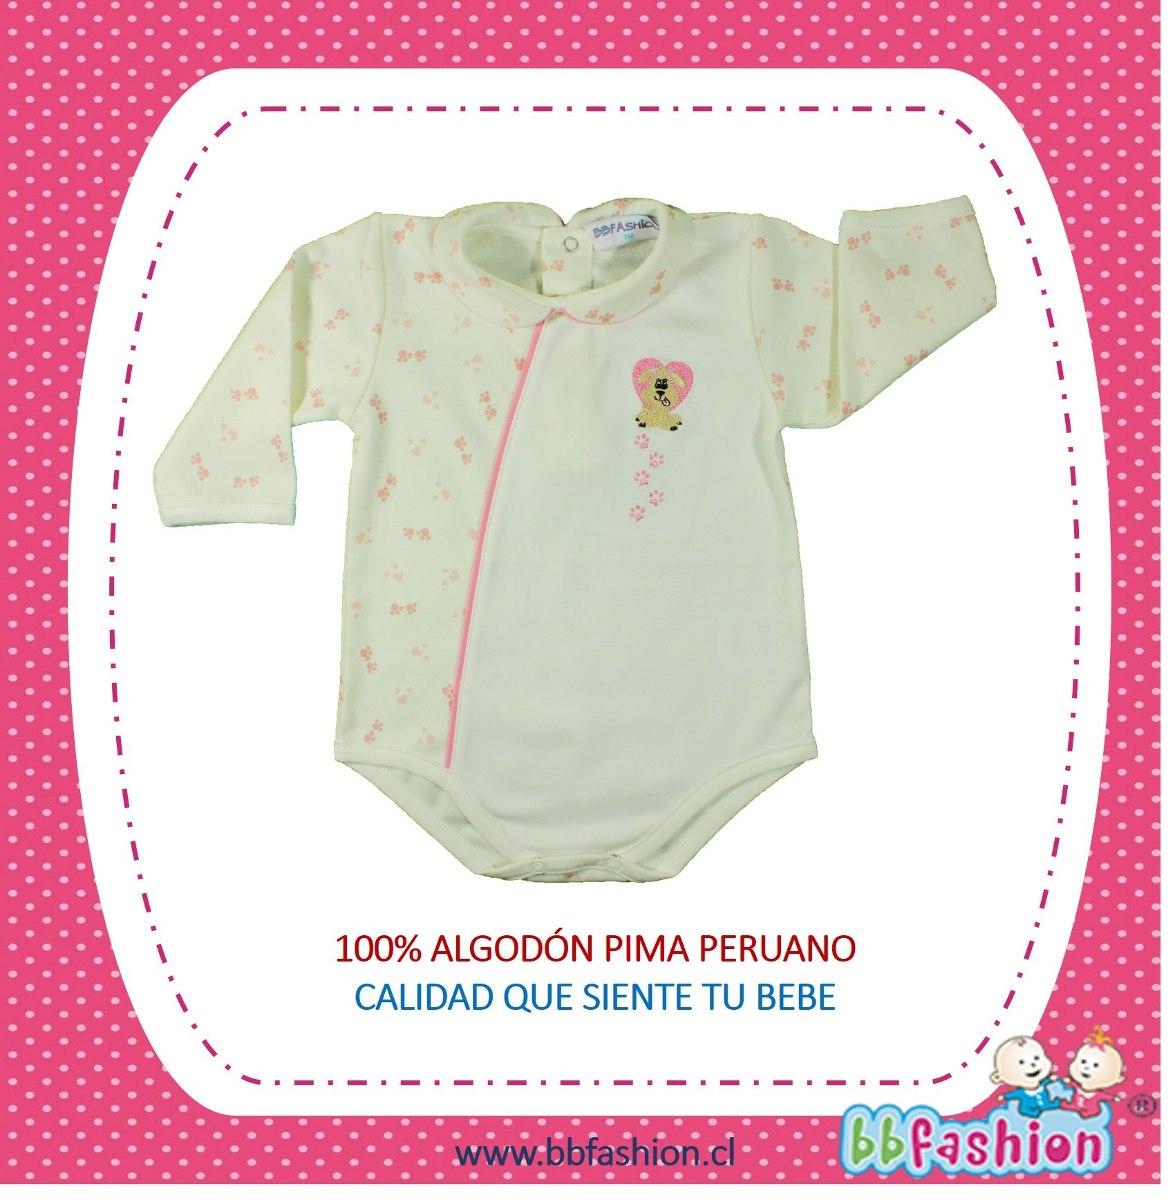 ropa de bebe 100 algodon pima